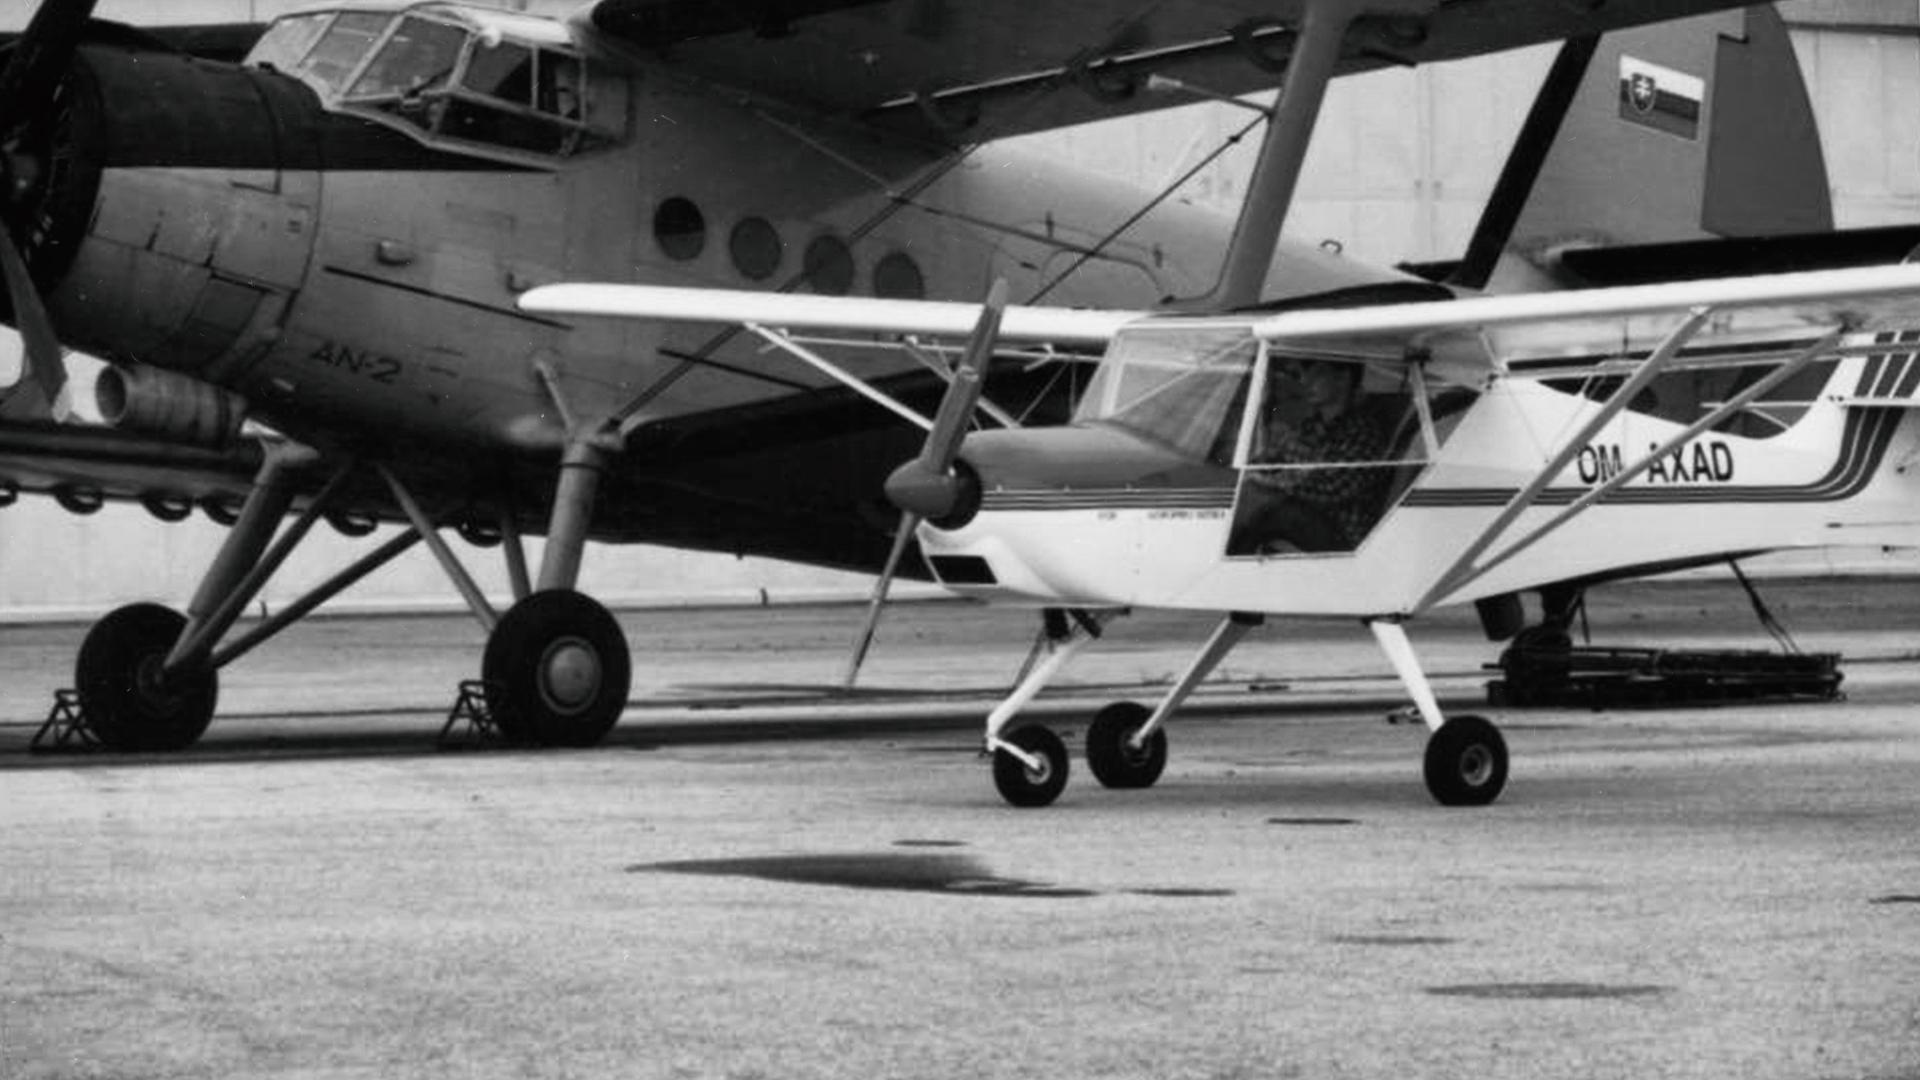 Aeropro / quality since 1990 — Aeropro